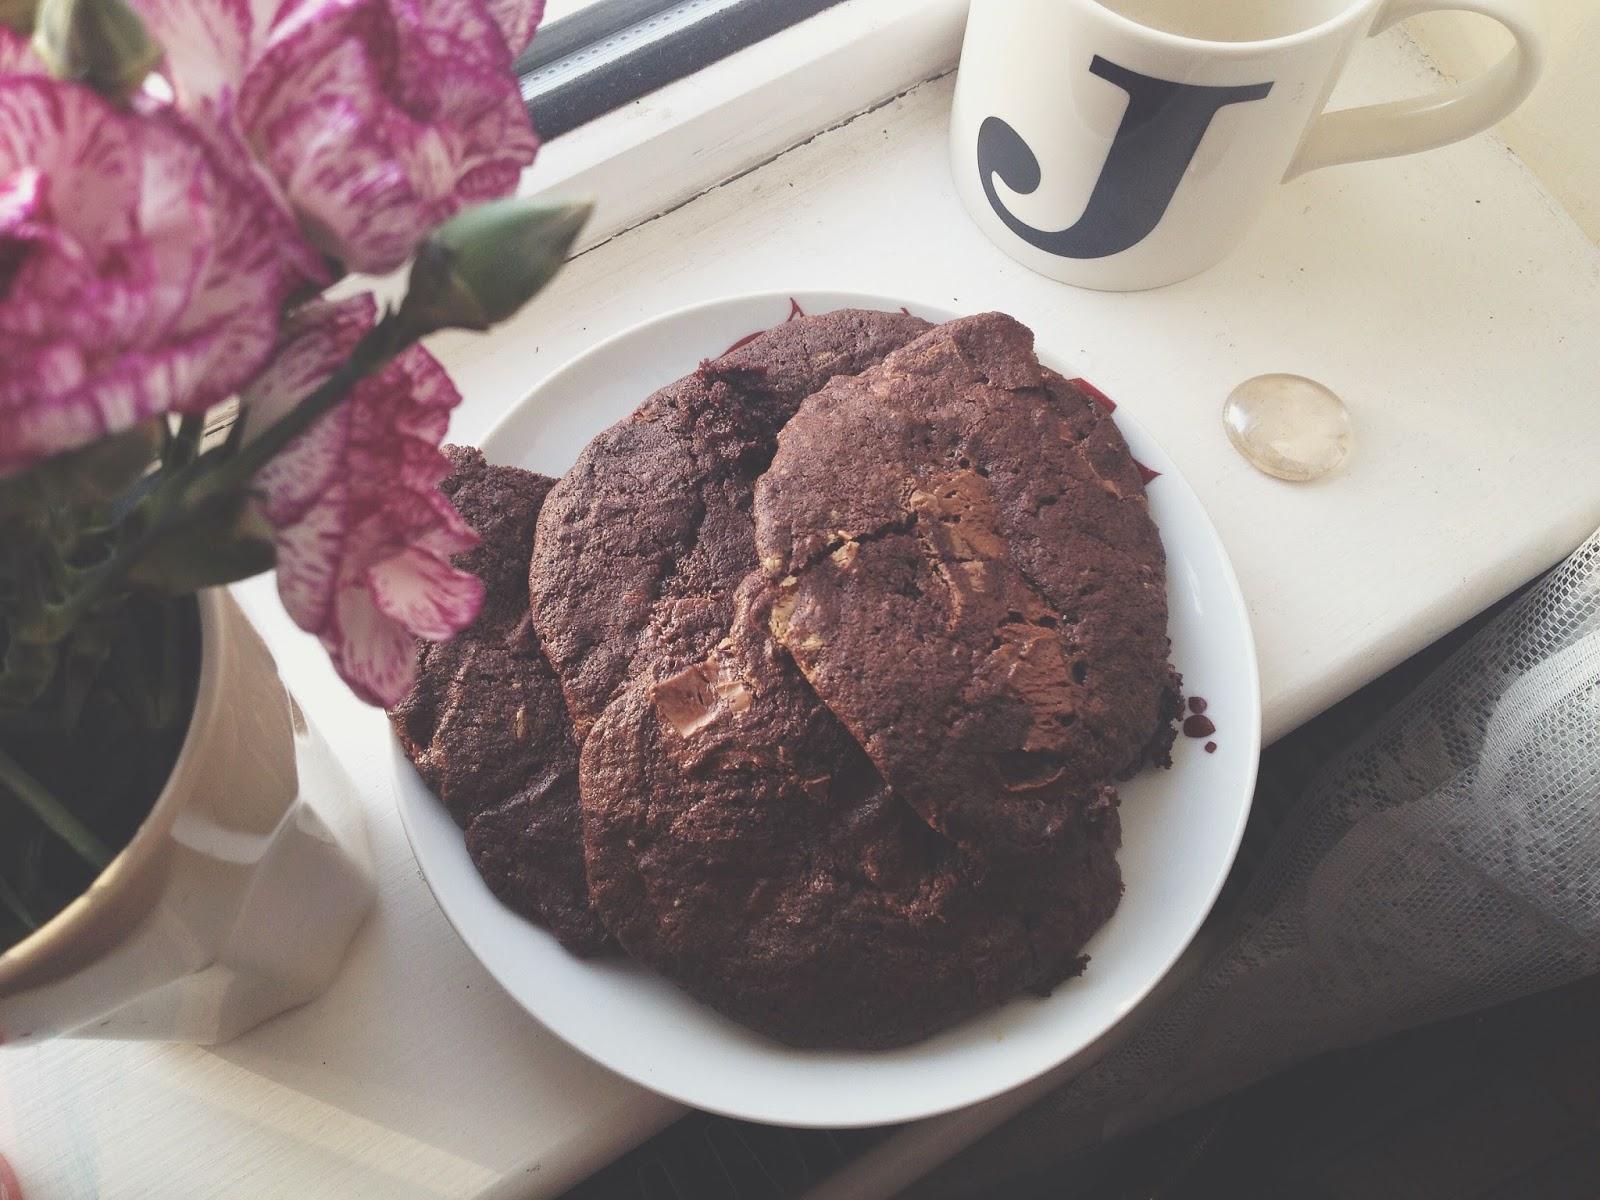 Milky Way Chocolate Chip Cookies